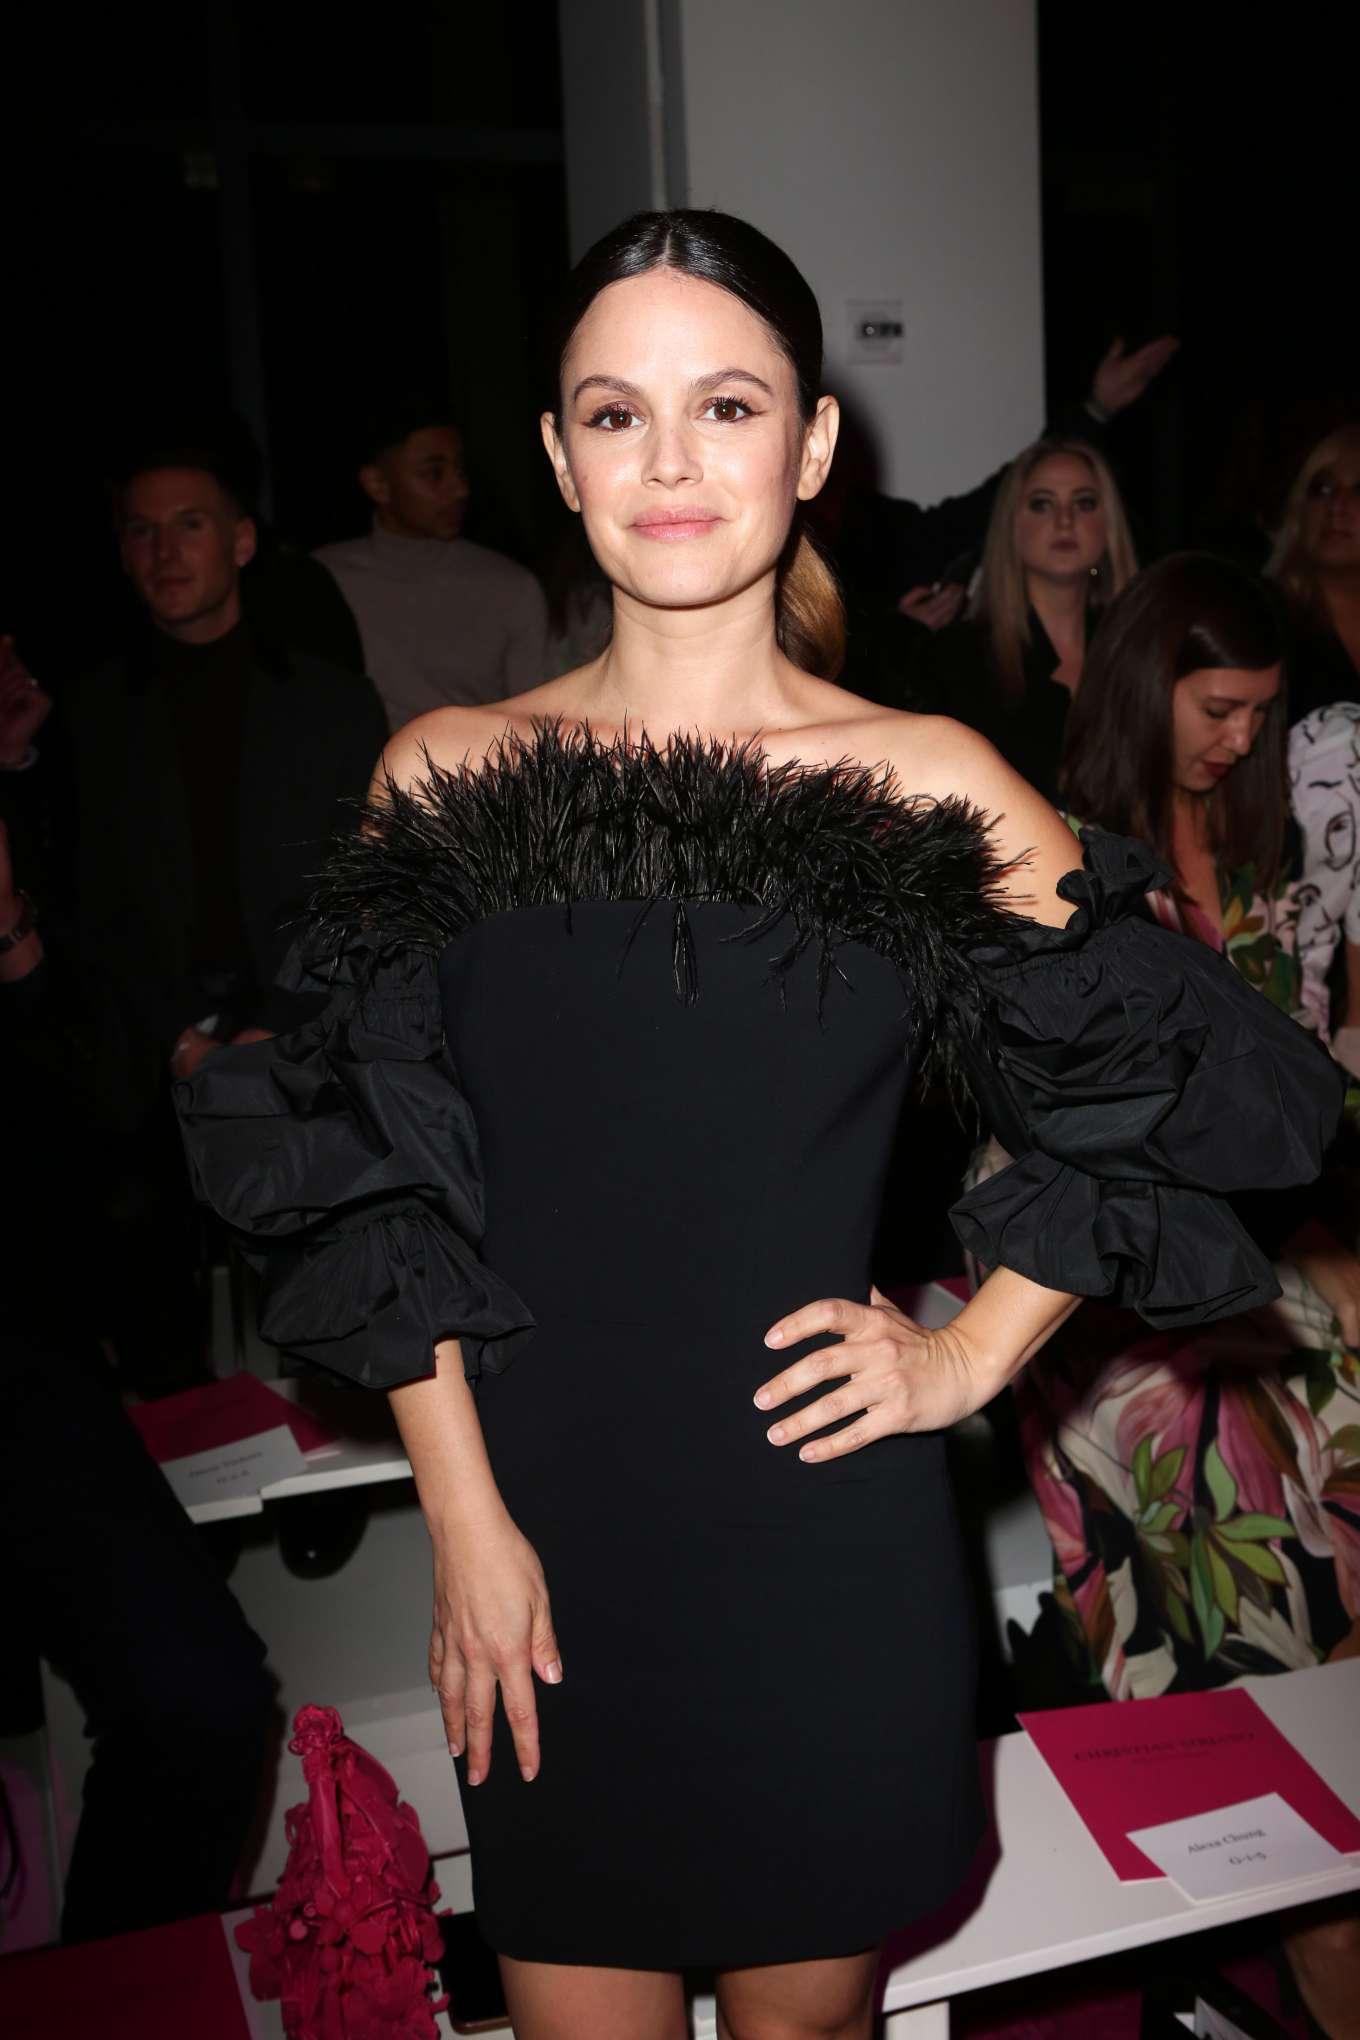 Rachel Bilson 2020 : Rachel Bilson – Christian Siriano Show at New York Fashion Week 2020-04